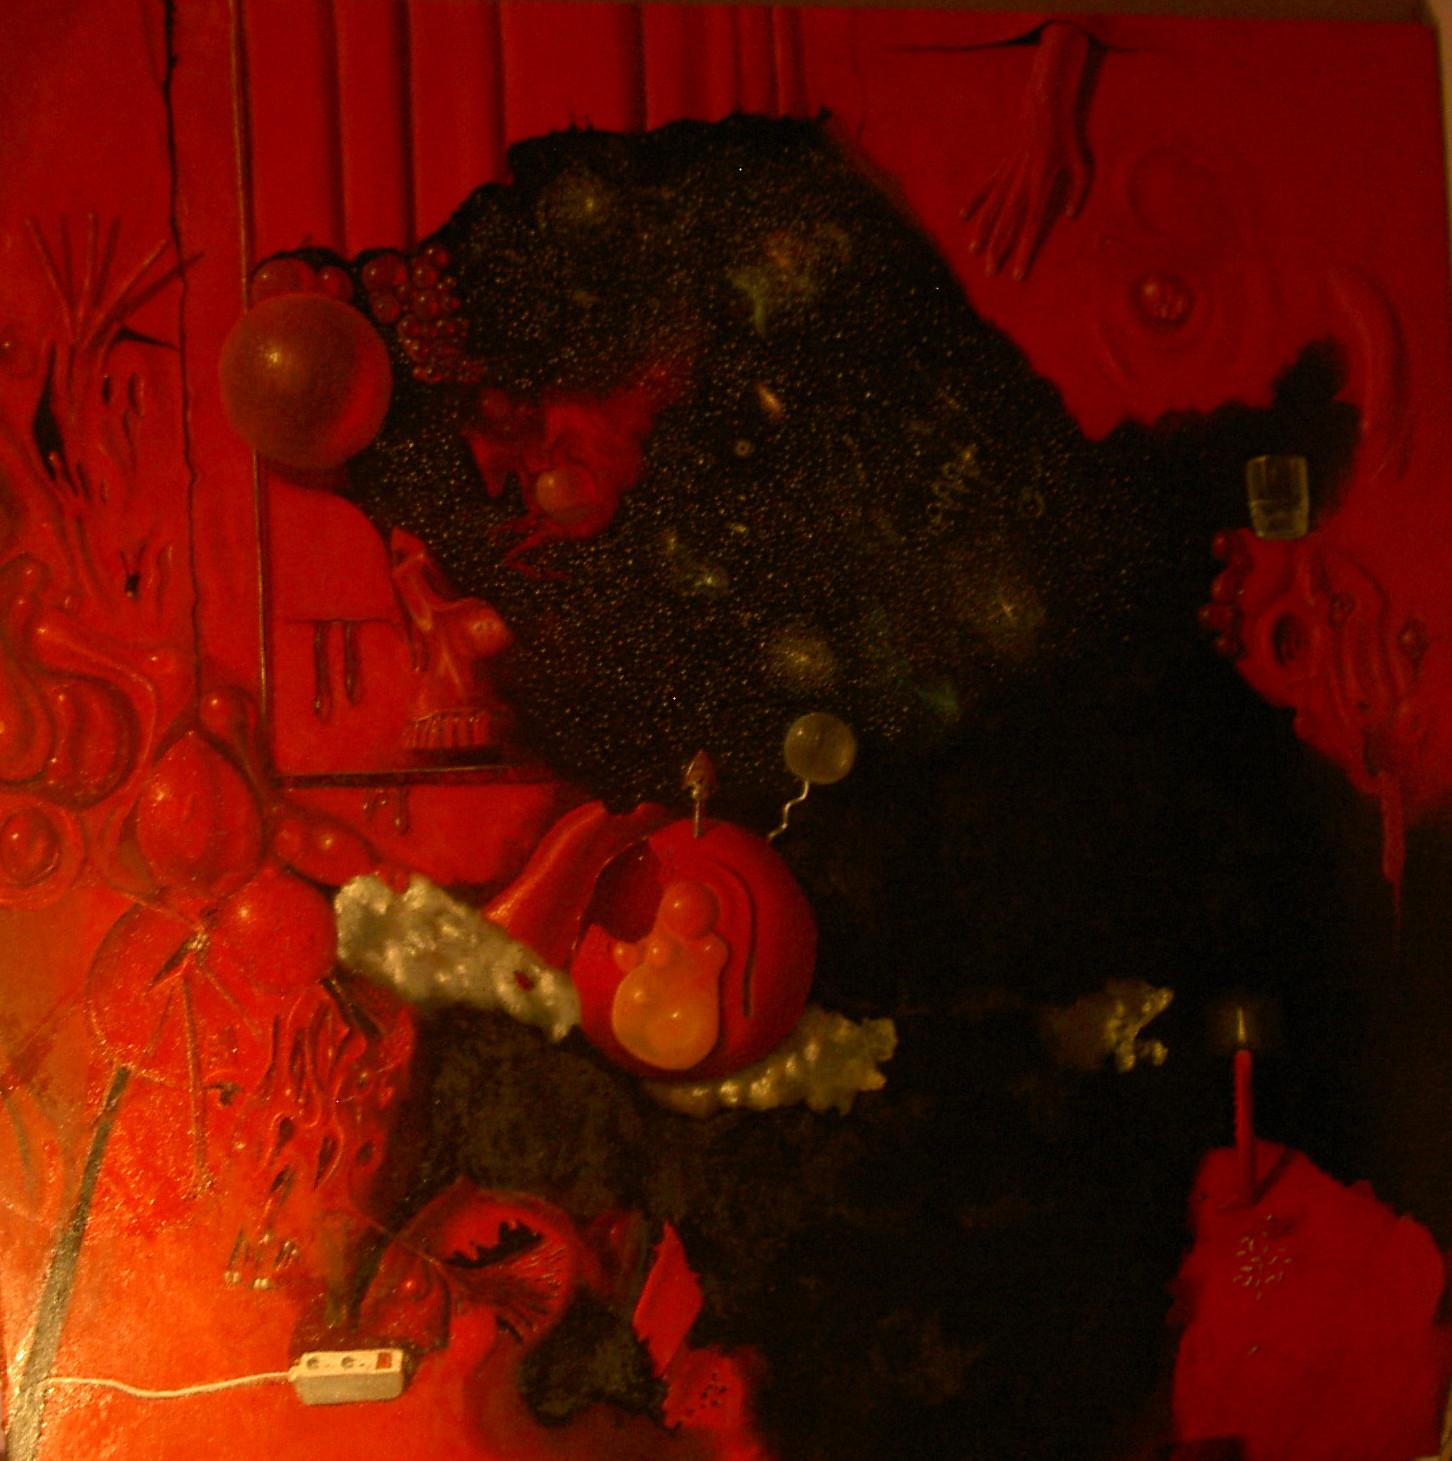 rouge, la toile maudite